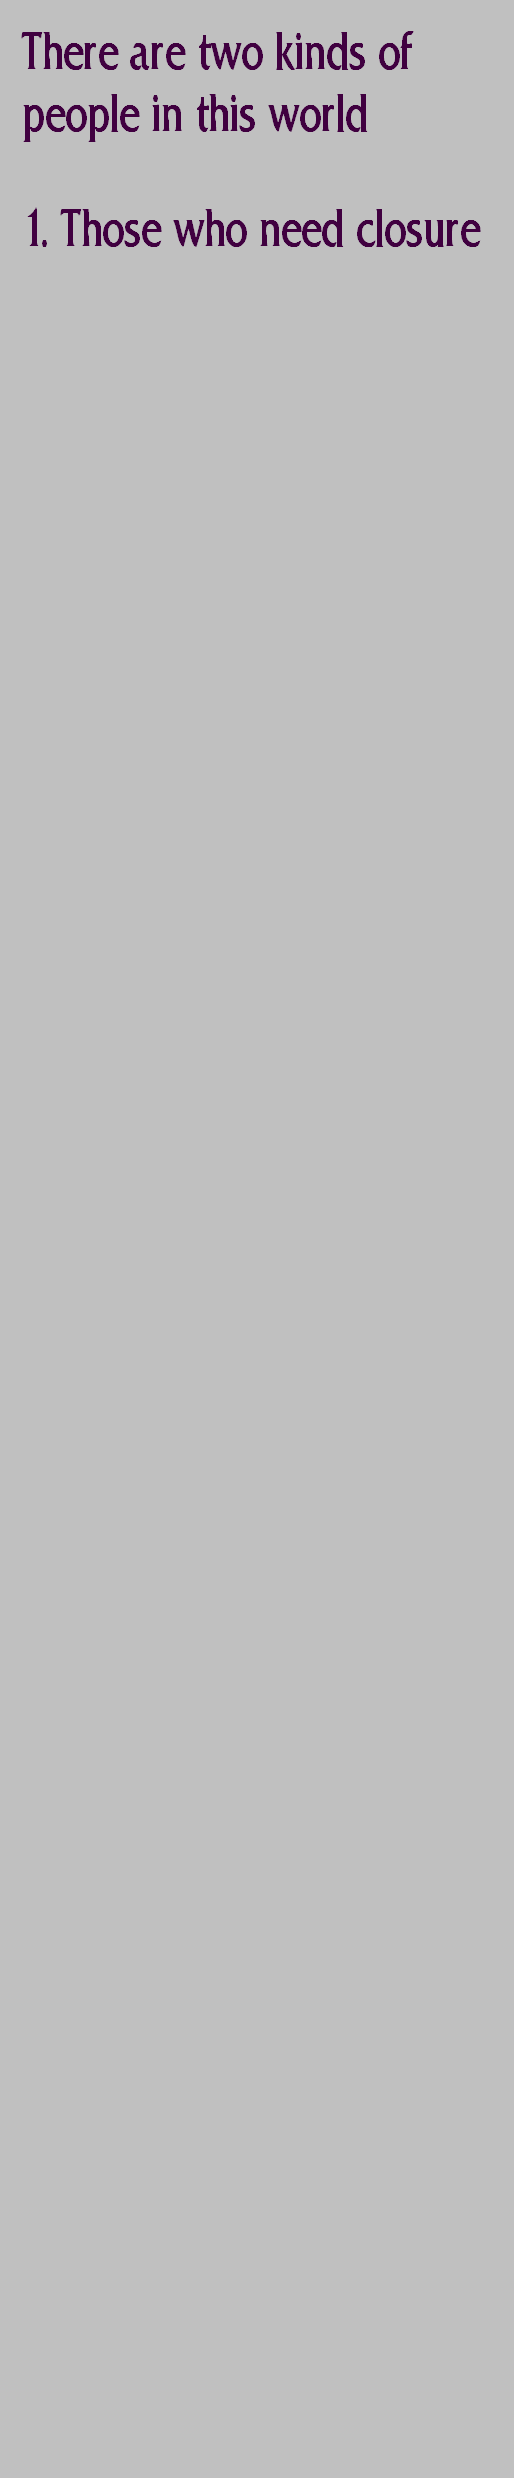 closure_.PNG (34 KB)